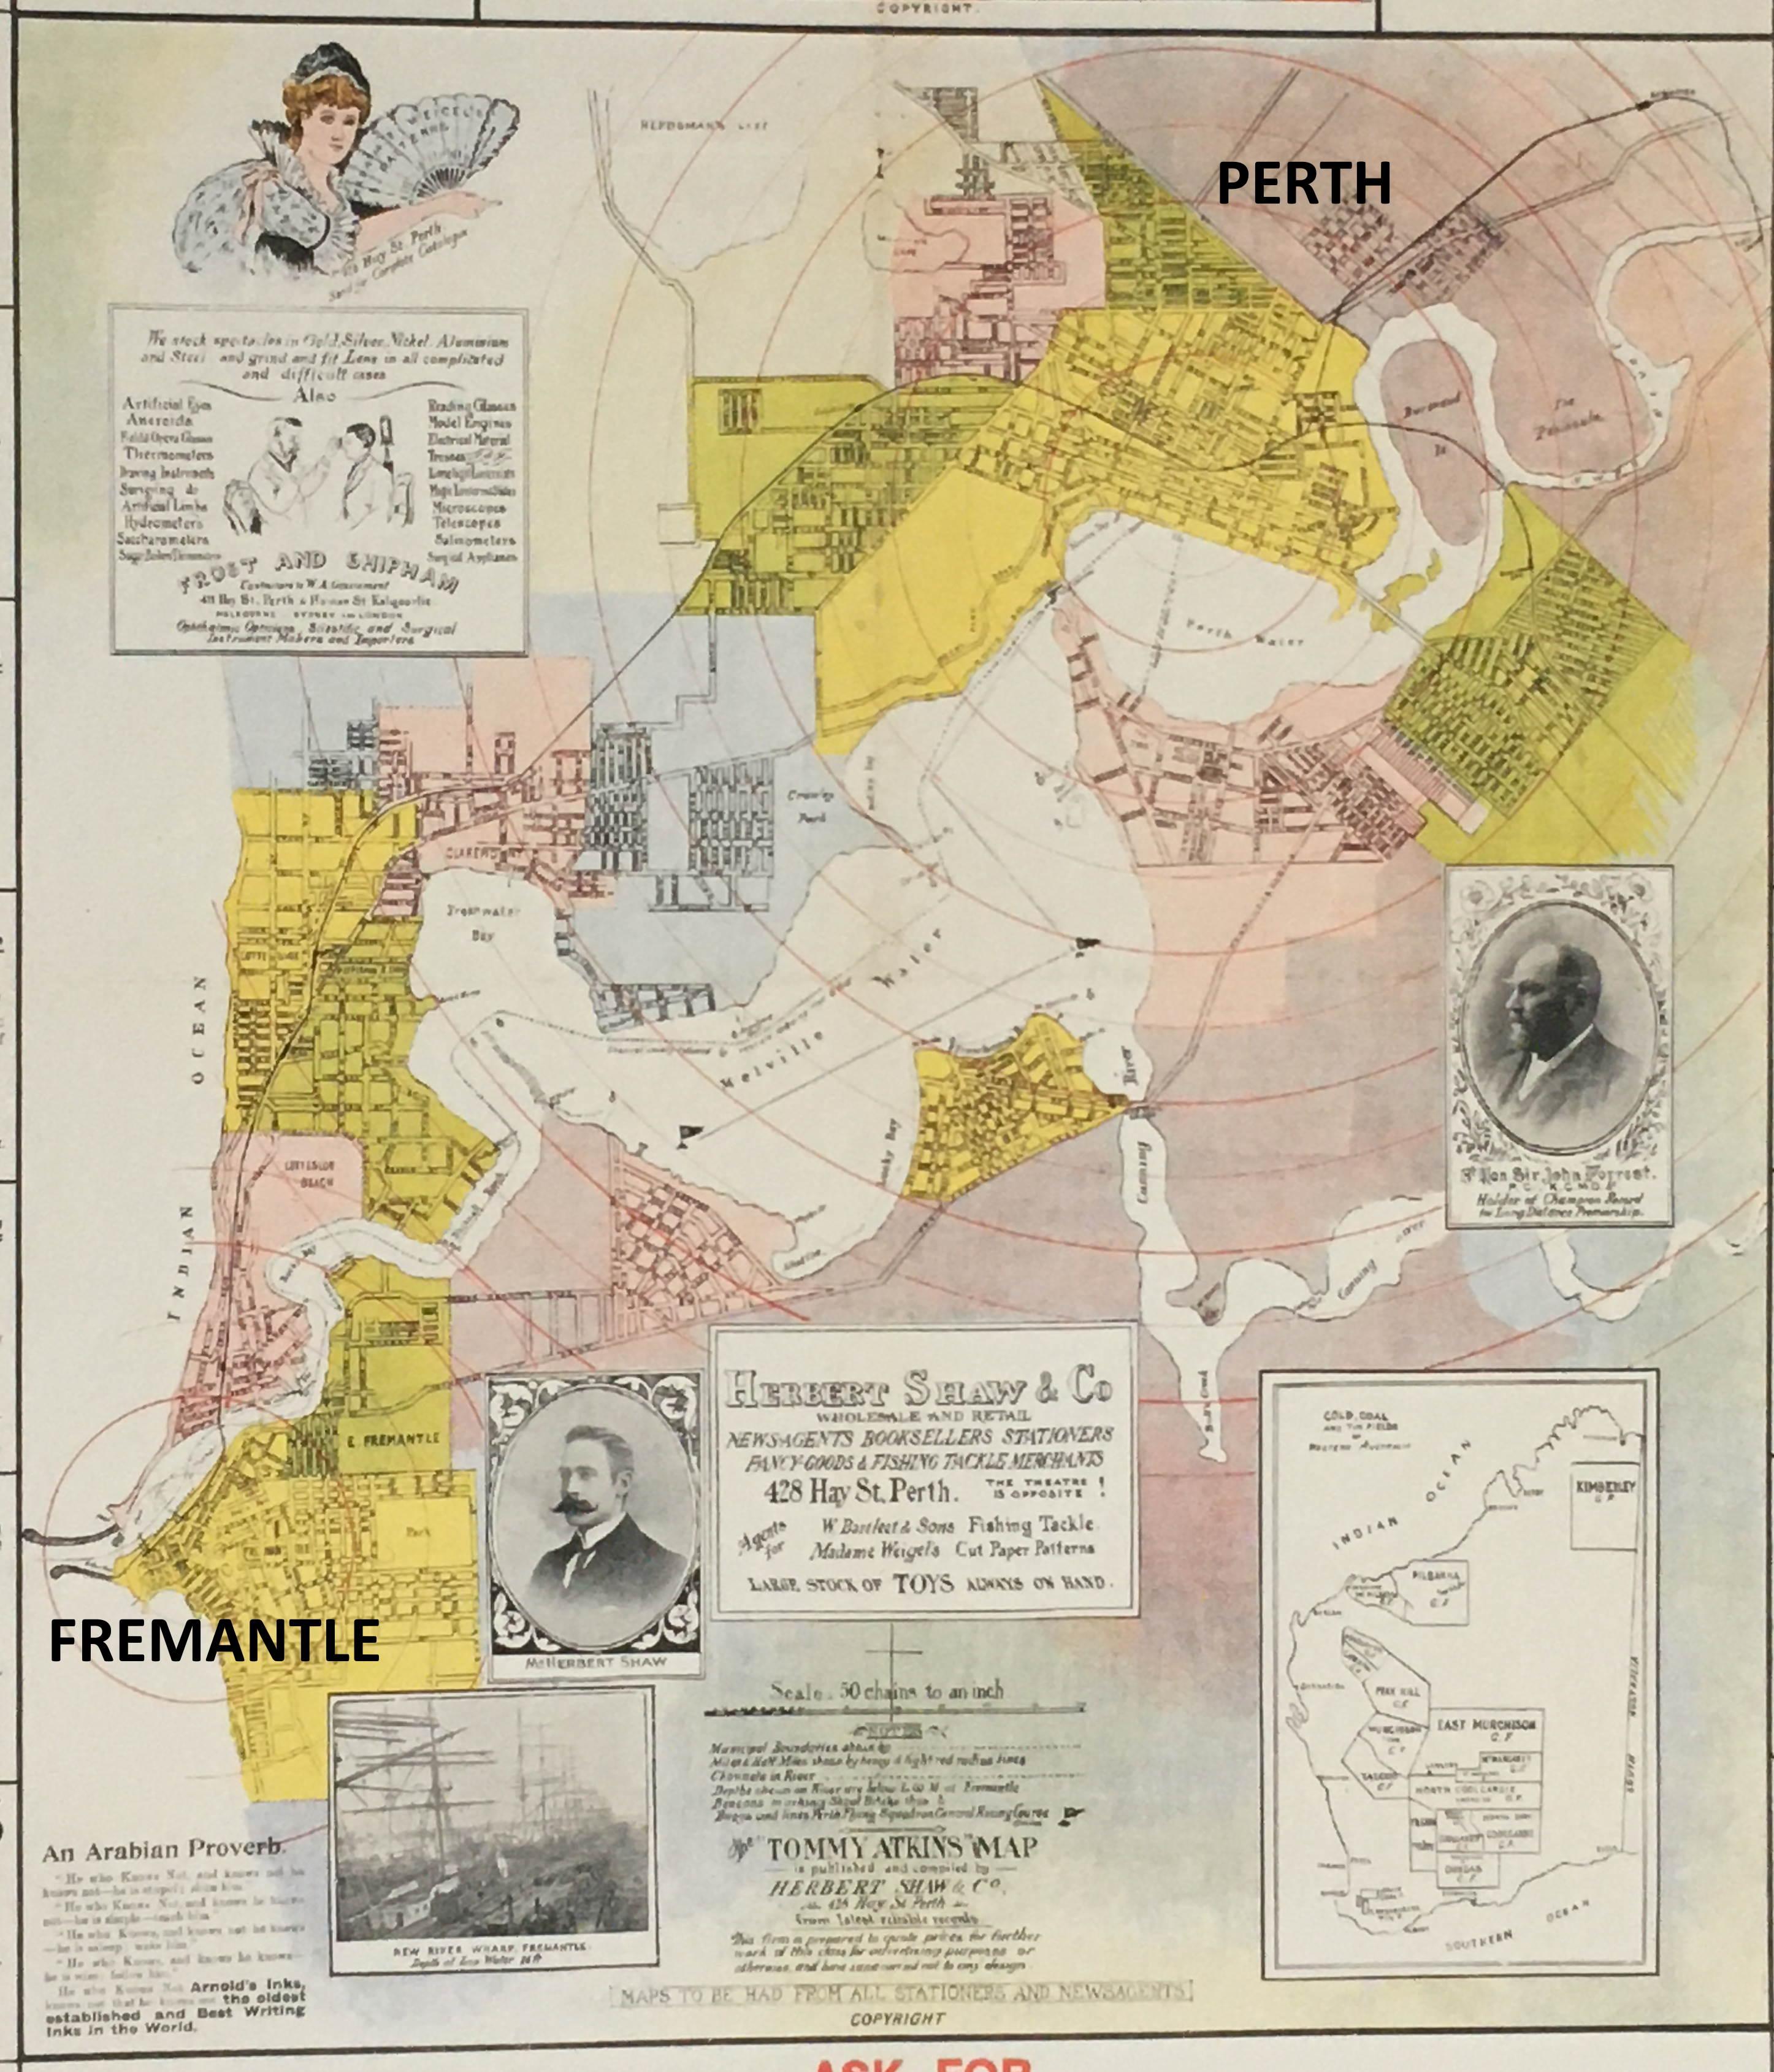 Perth map 1900